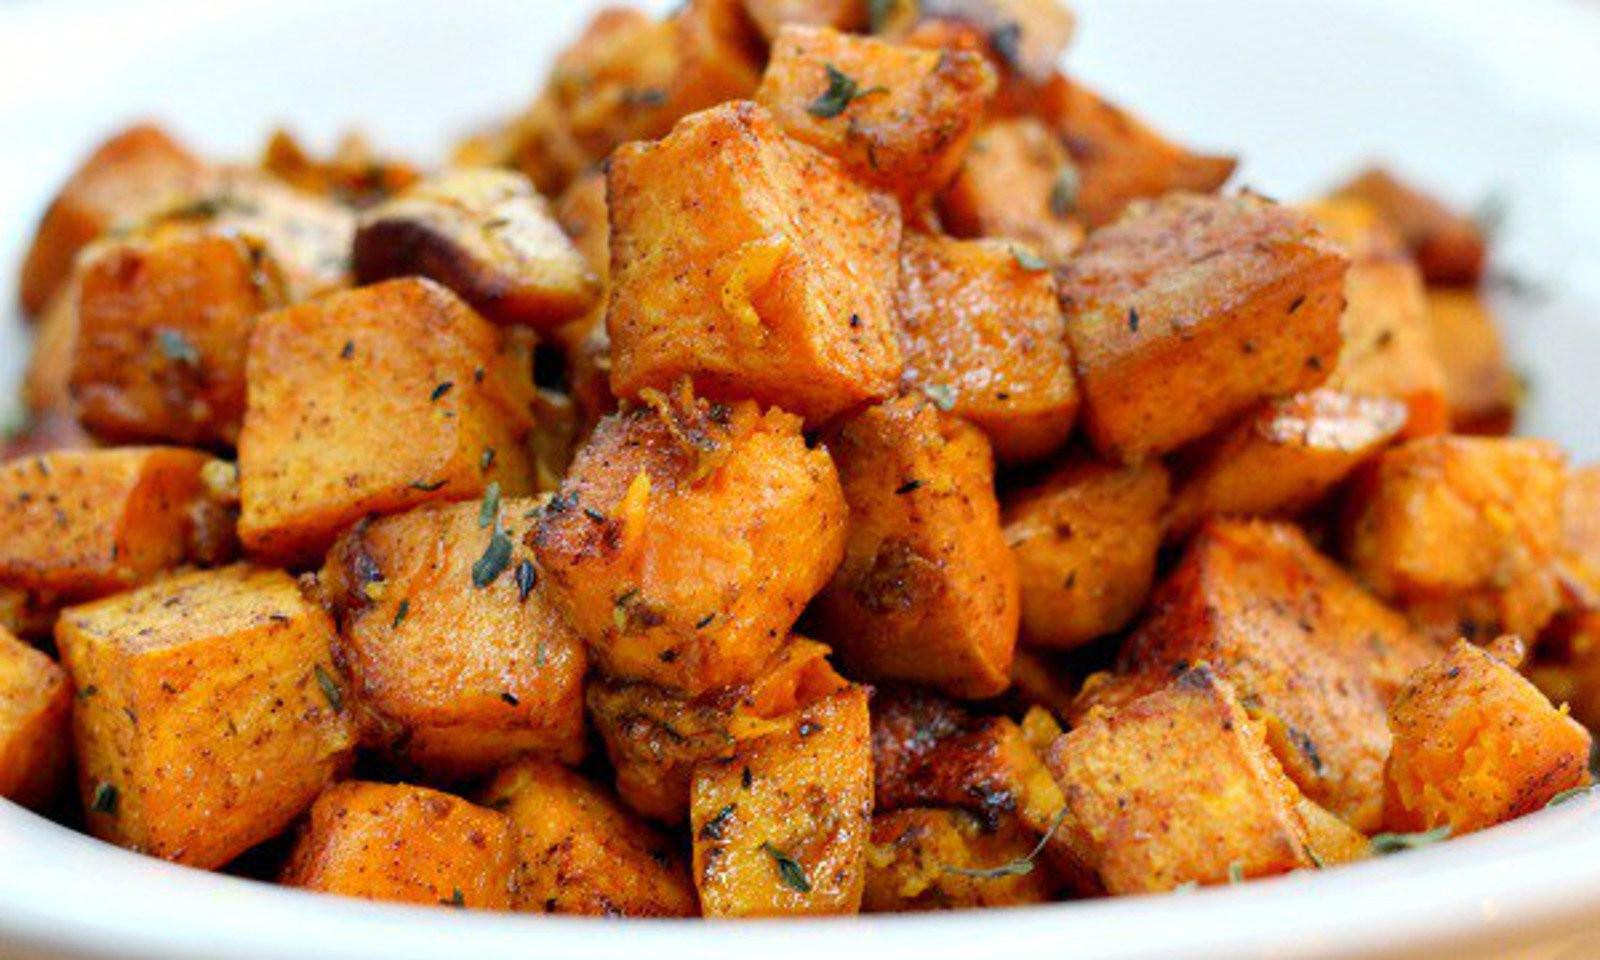 Vegetarian Recipes With Potatoes  Cinnamon Turmeric Sweet Potatoes [Vegan] e Green